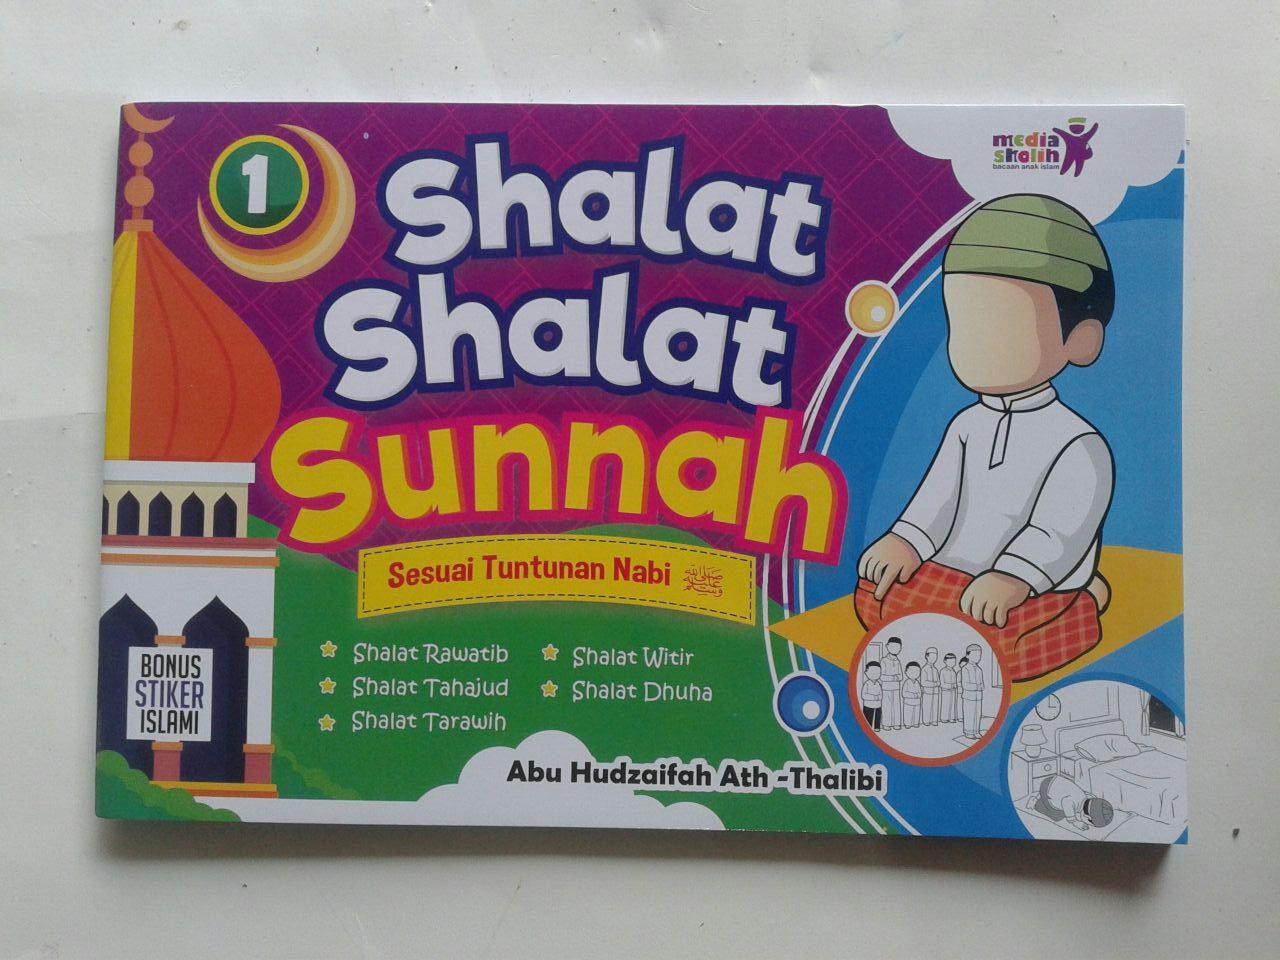 Buku Anak Shalat Shalat Sunnah Sesuai Tuntunan Nabi 1 cover 2